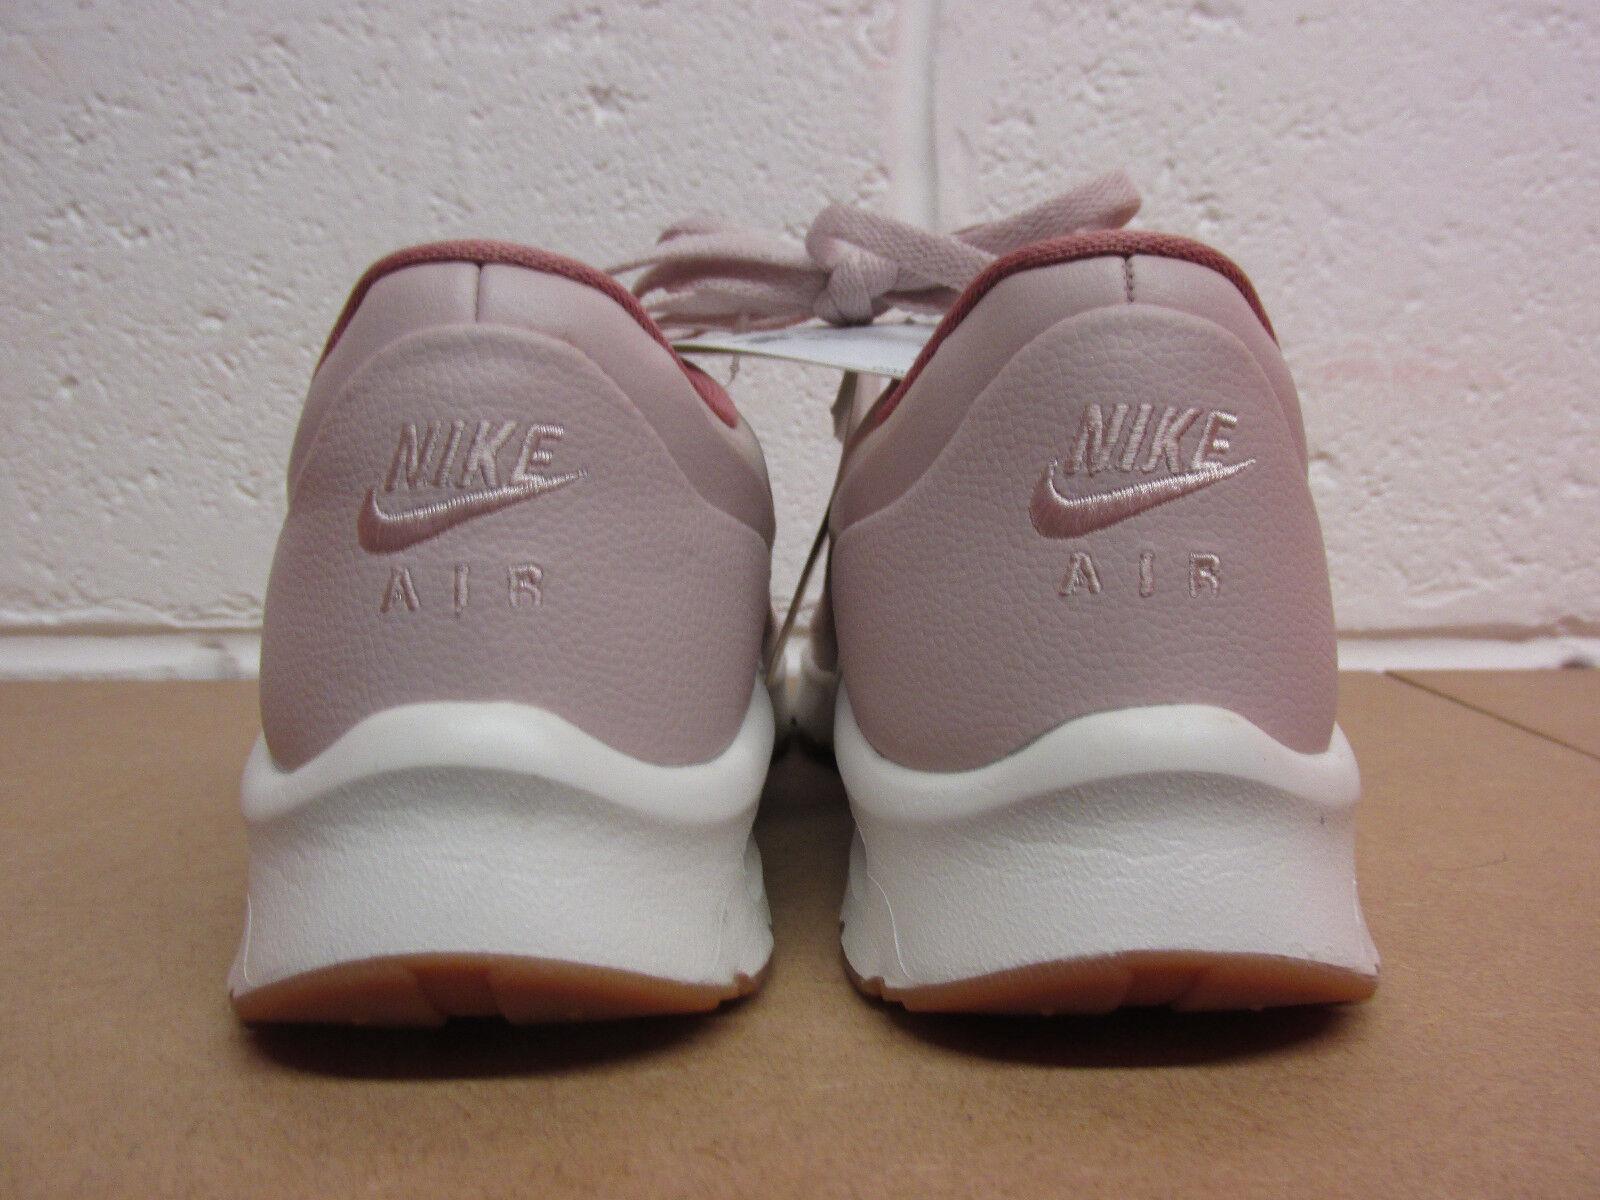 online retailer b6820 007bd ... Nike Air Max Jewell 896195 601 Zapatillas de Mujer Zapatillas  Zapatillas Zapatillas Muestra c0df0d ...